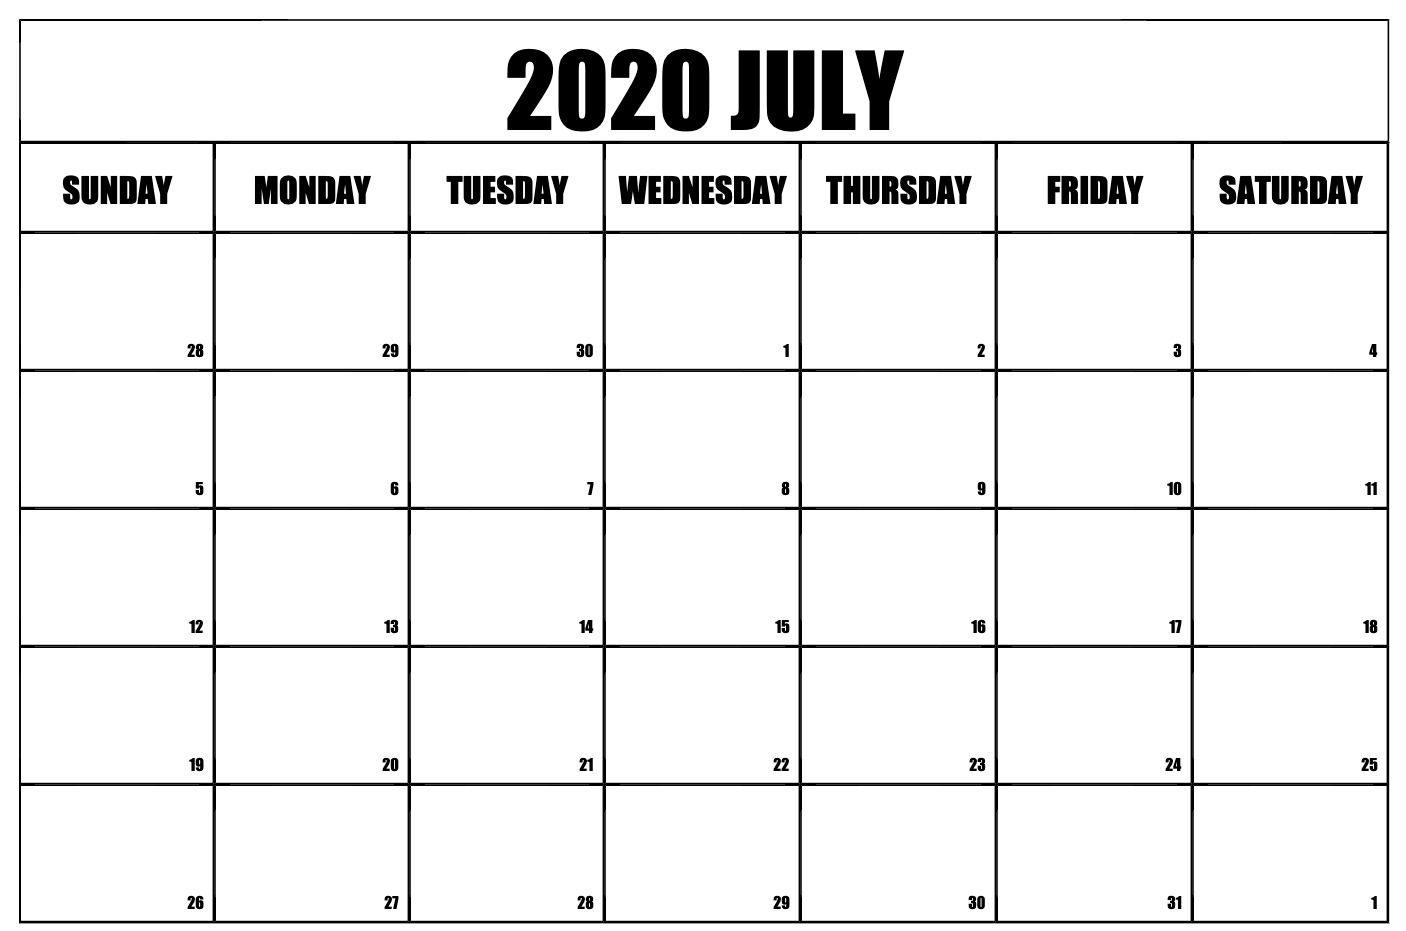 Free Printable July 2020 Calendar | Free Printable Calendar with regard to 2020 Printable Calendar Sunday To Saturday